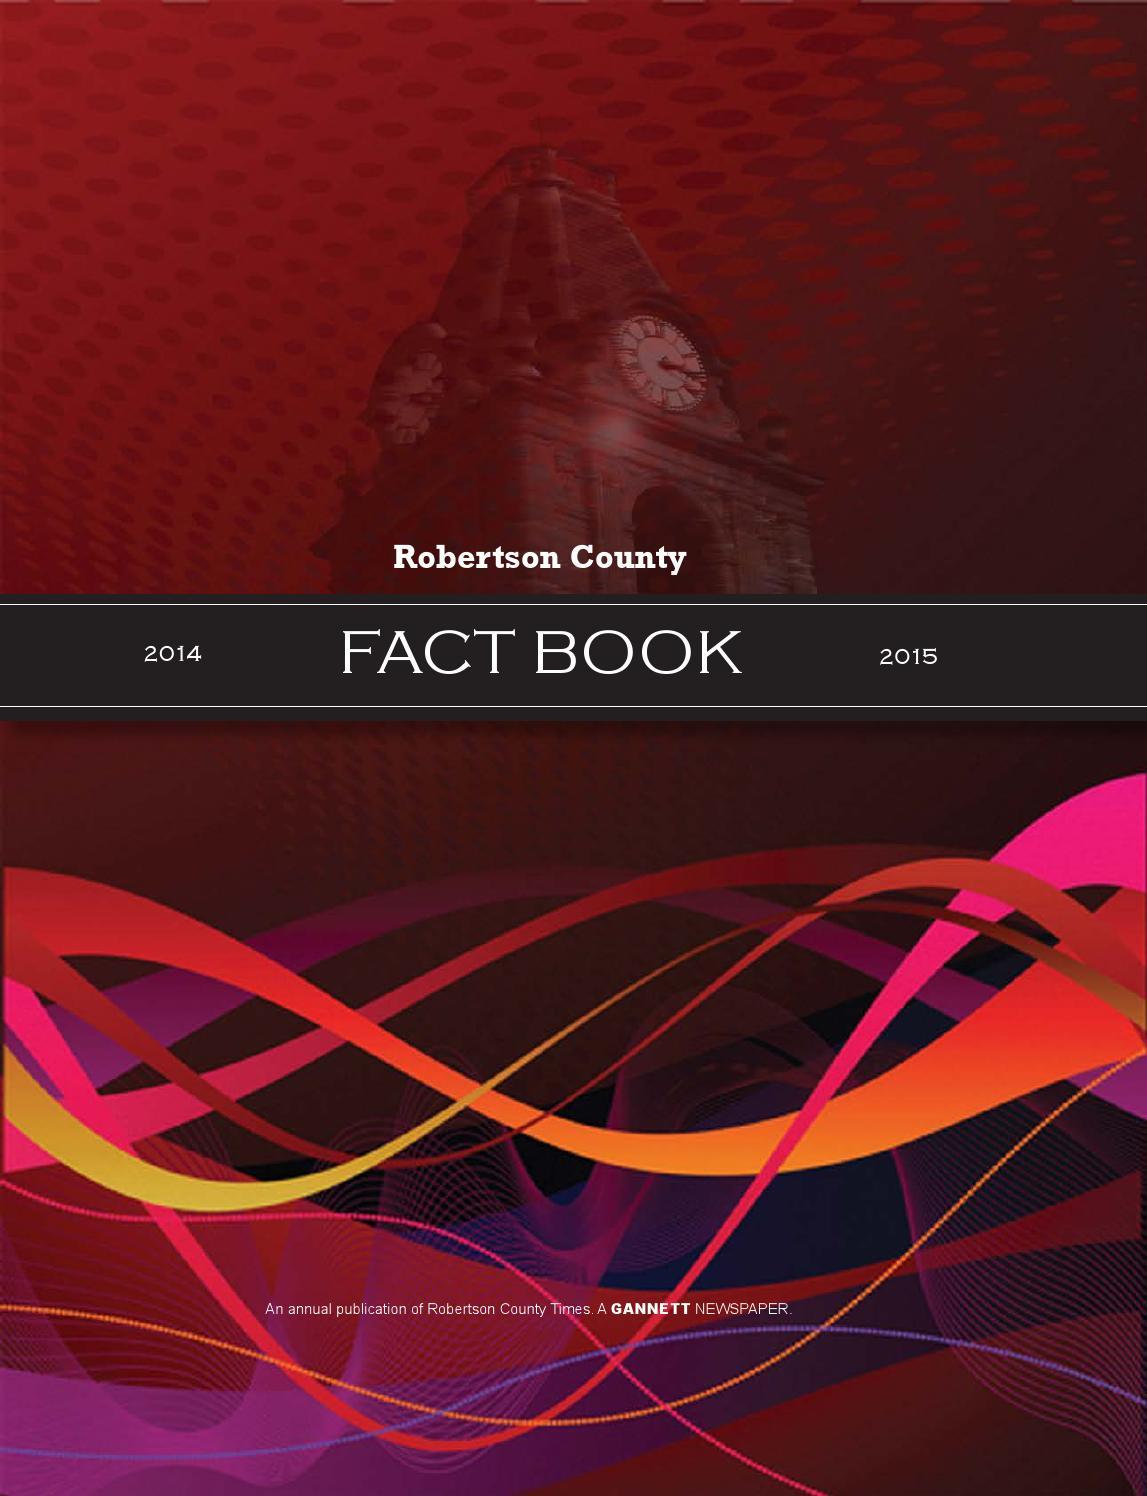 Pleasant Robertson County 2014 15 Fact Book By Tnmedia Issuu Evergreenethics Interior Chair Design Evergreenethicsorg